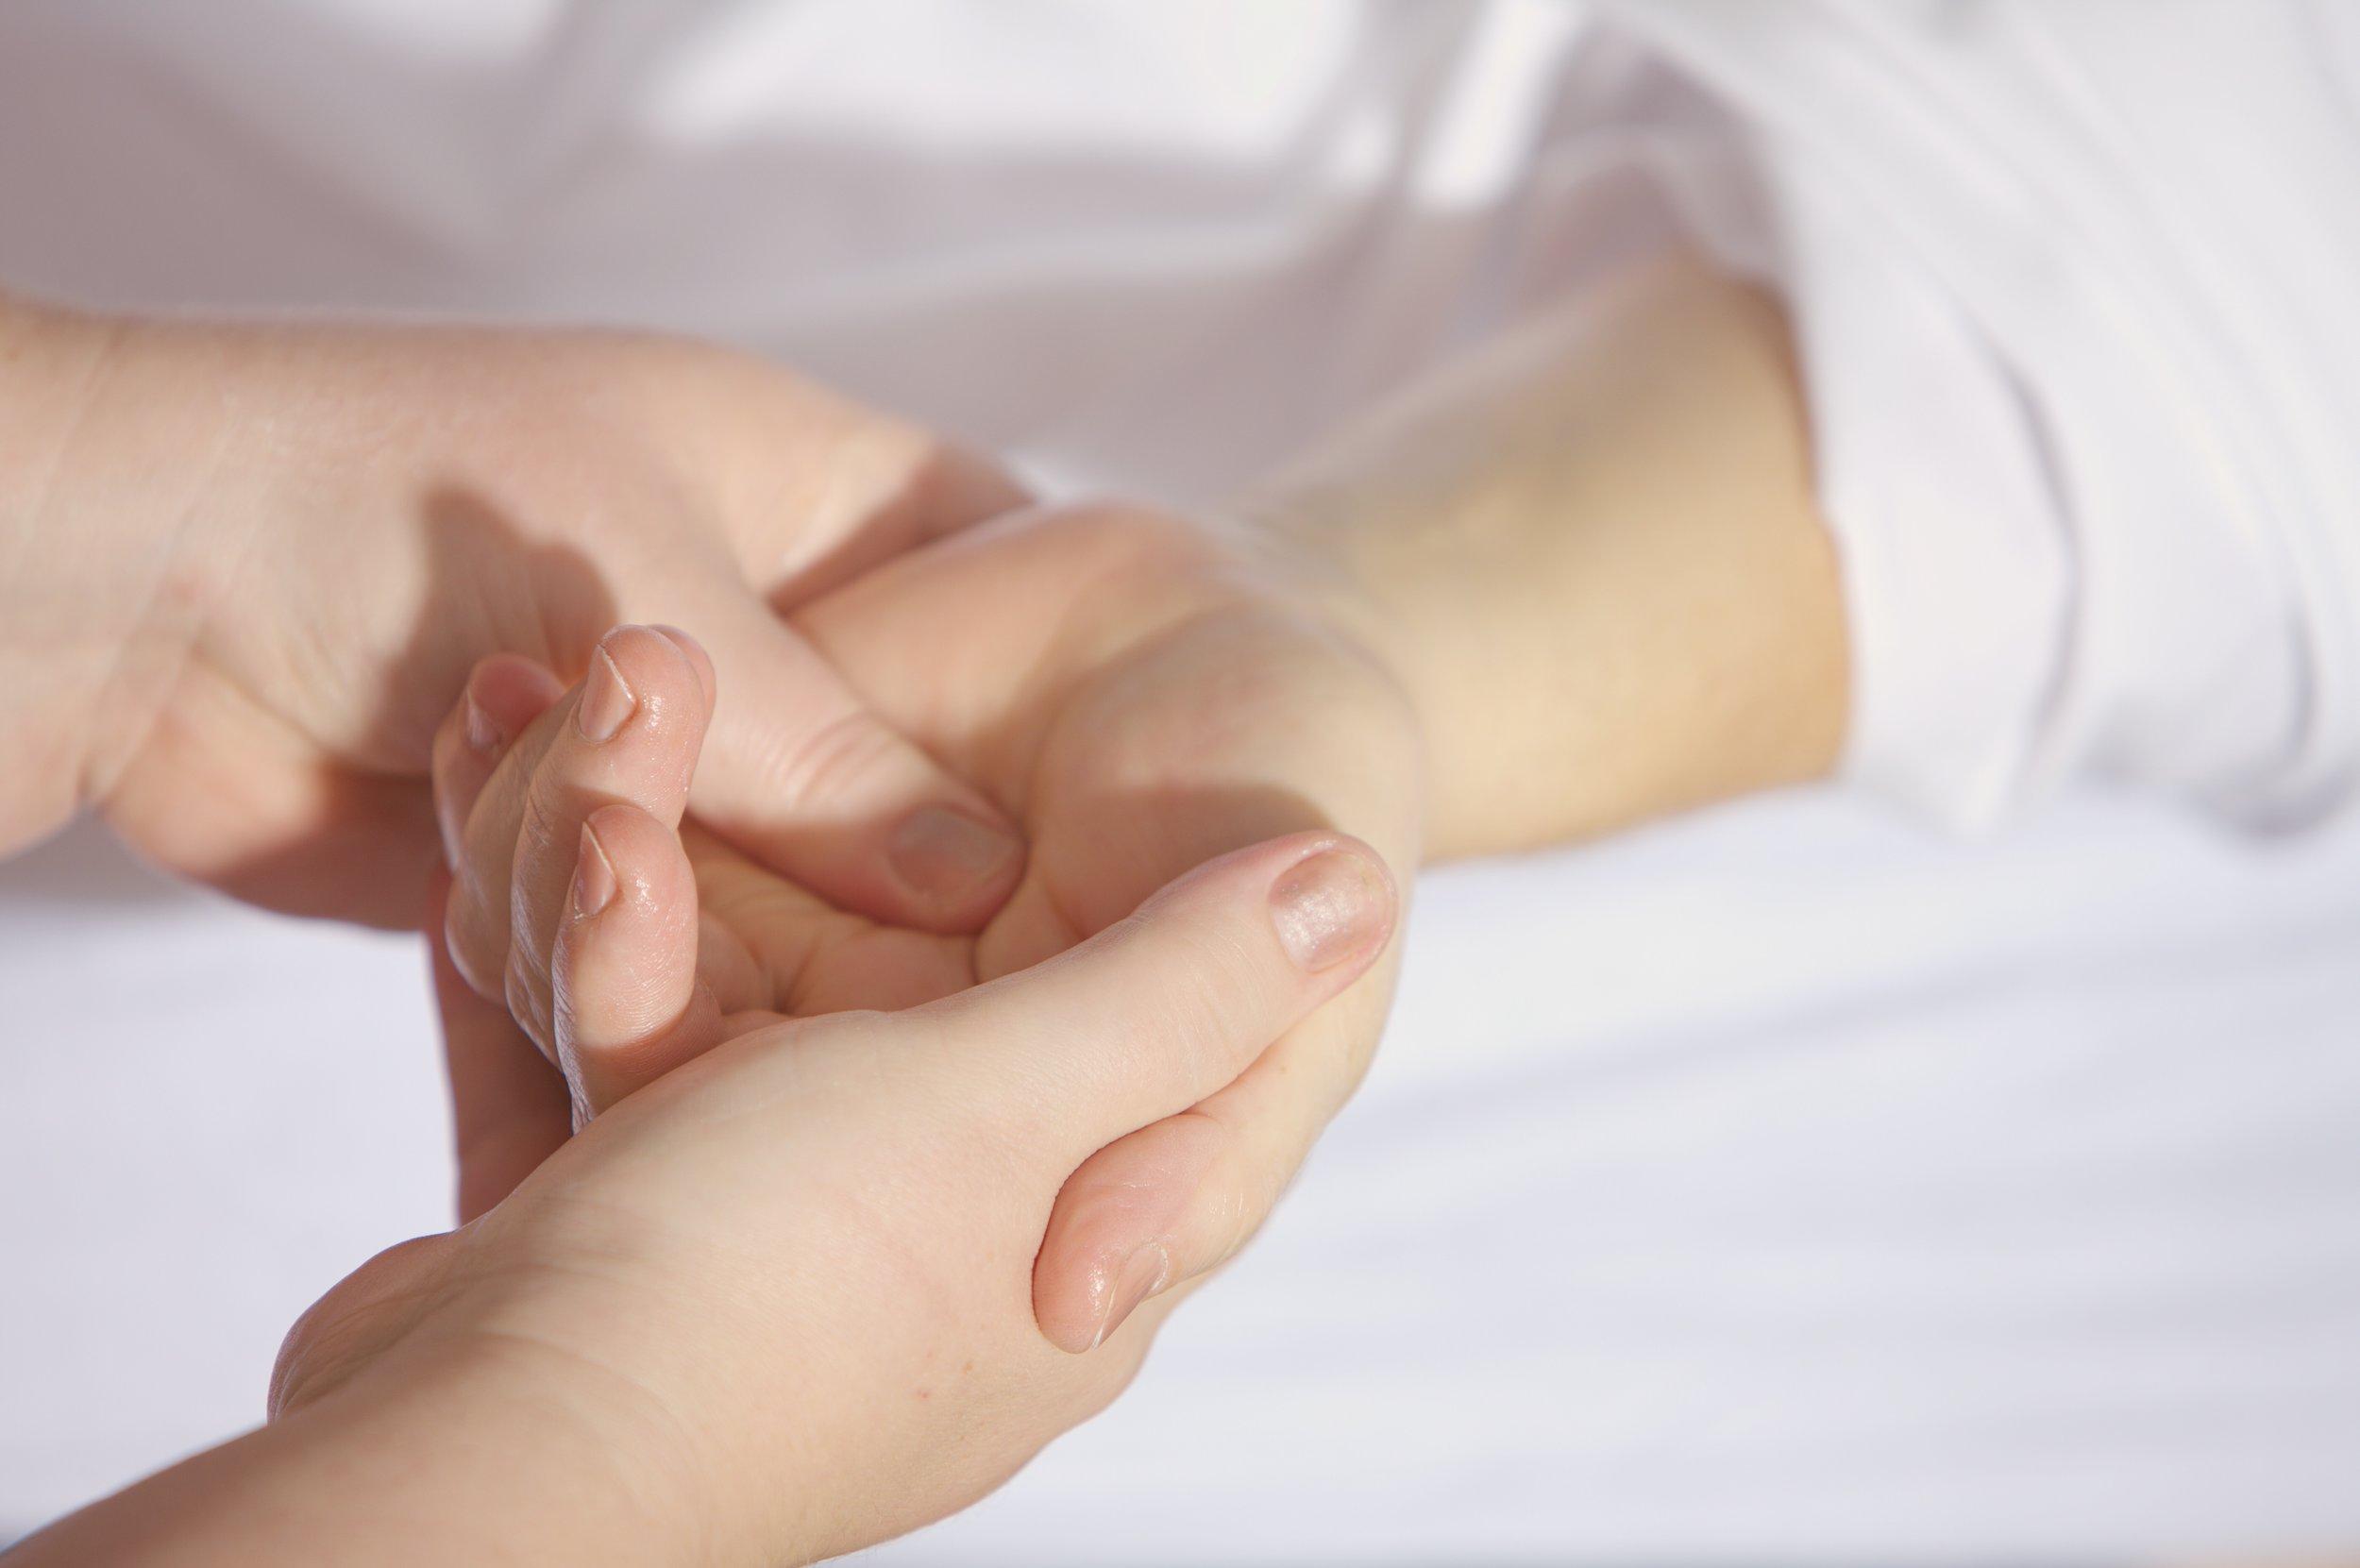 treatment-finger-keep-hand-161477.jpeg